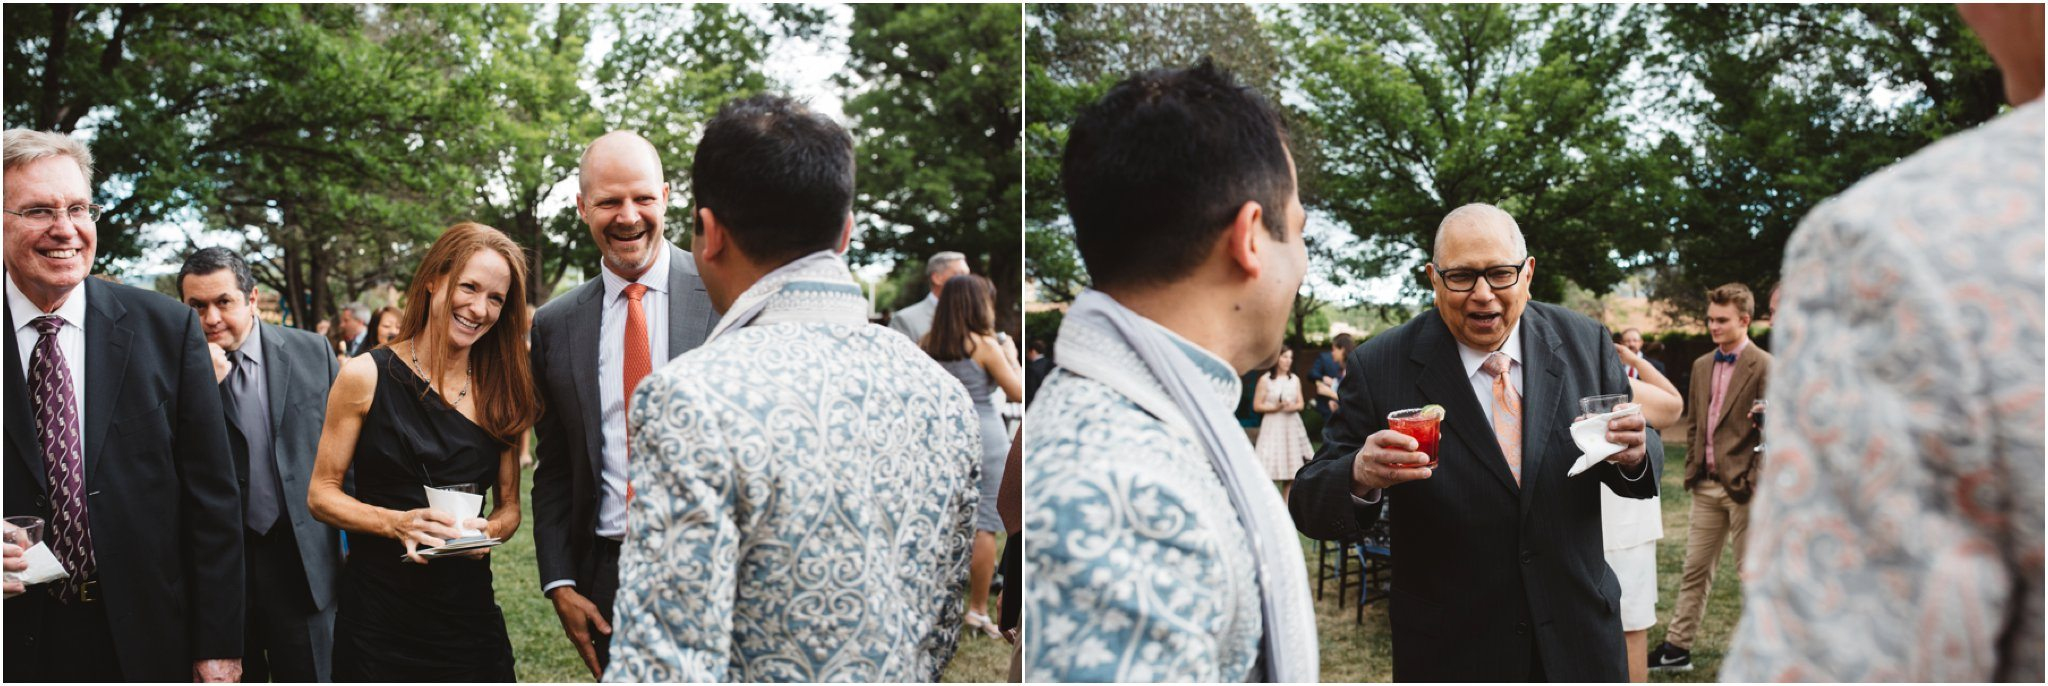 0025new-mexico-same-sex-wedding_santa-fe-wedding-photographer_albuquerque-wedding-photographer_top-photographer_-southwest-wedding-photography_-blue-rose-studio